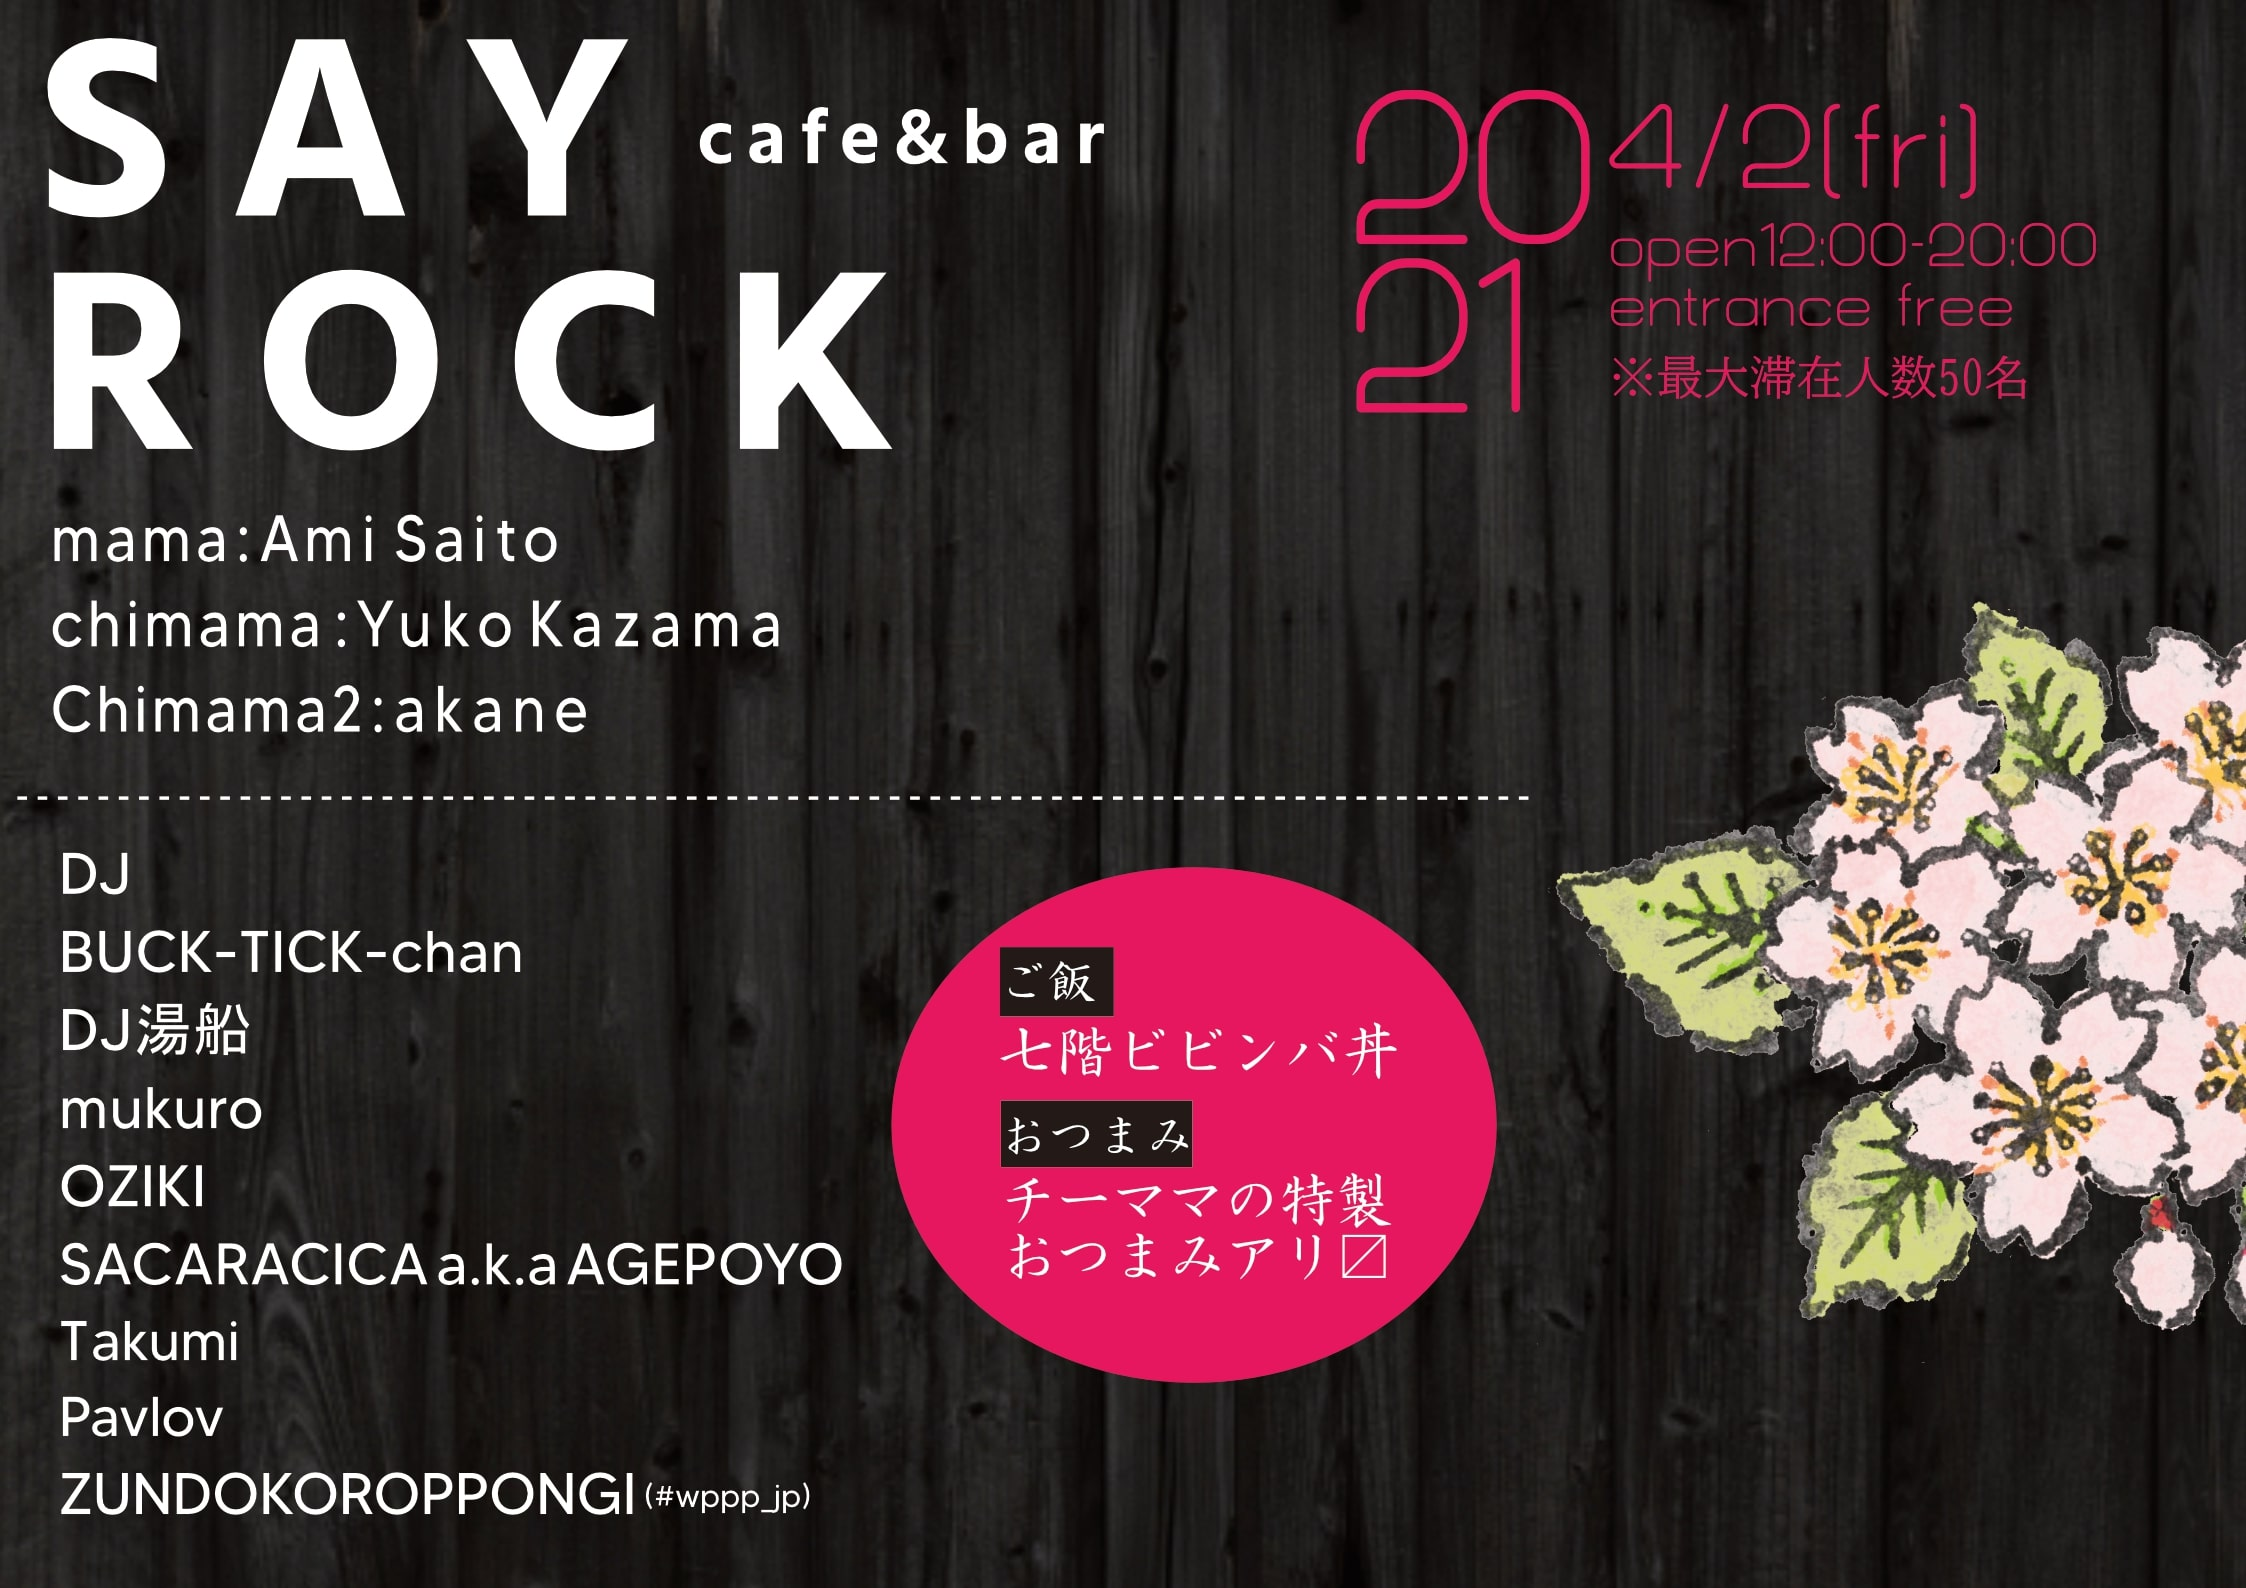 cafe&bar SAYROCK